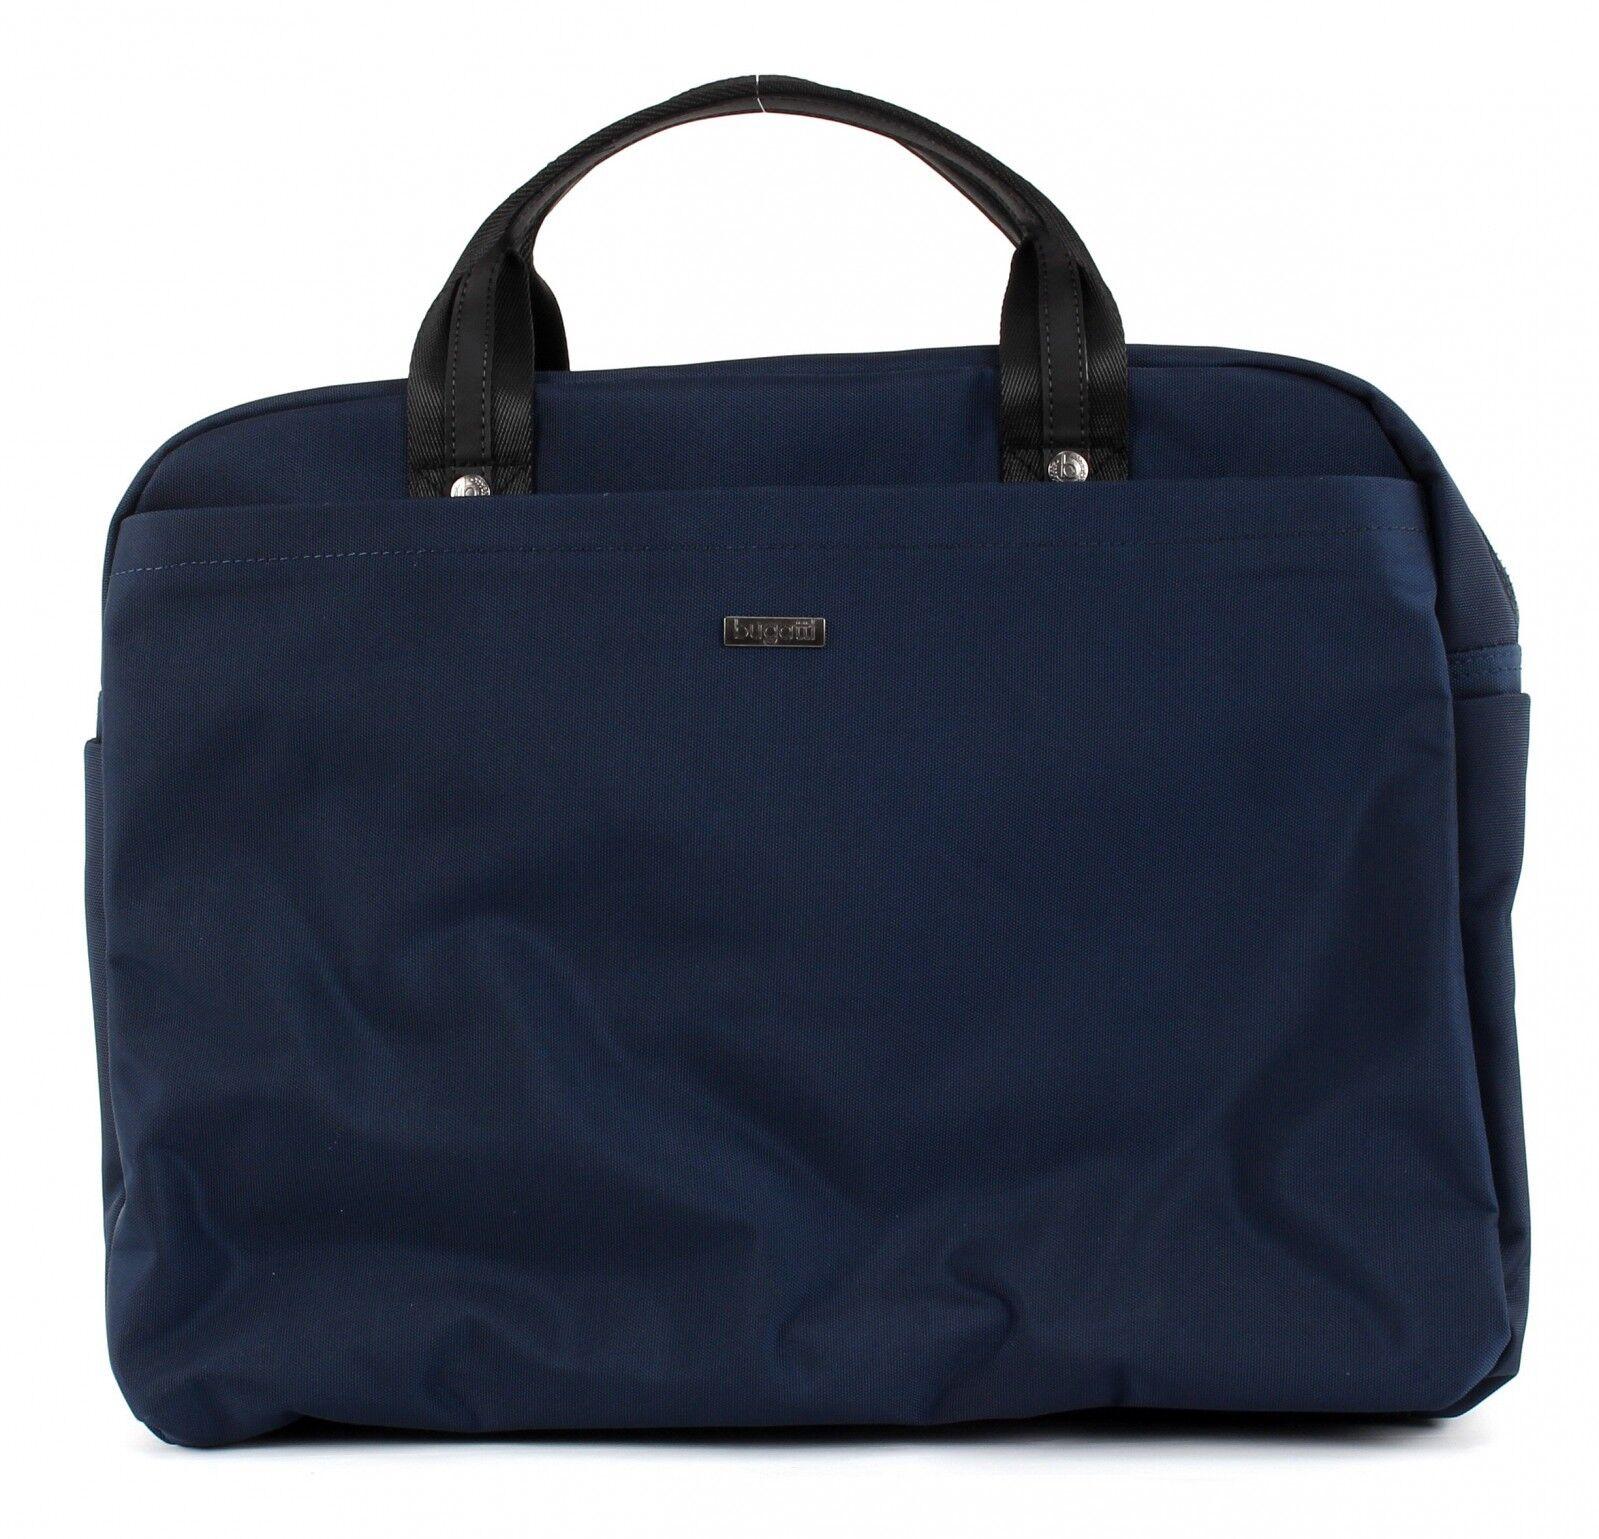 17f09ef68afea3 bugatti Contratempo Business Bag Large Umhängetasche Aktentasche Herren Blau  Neu фото